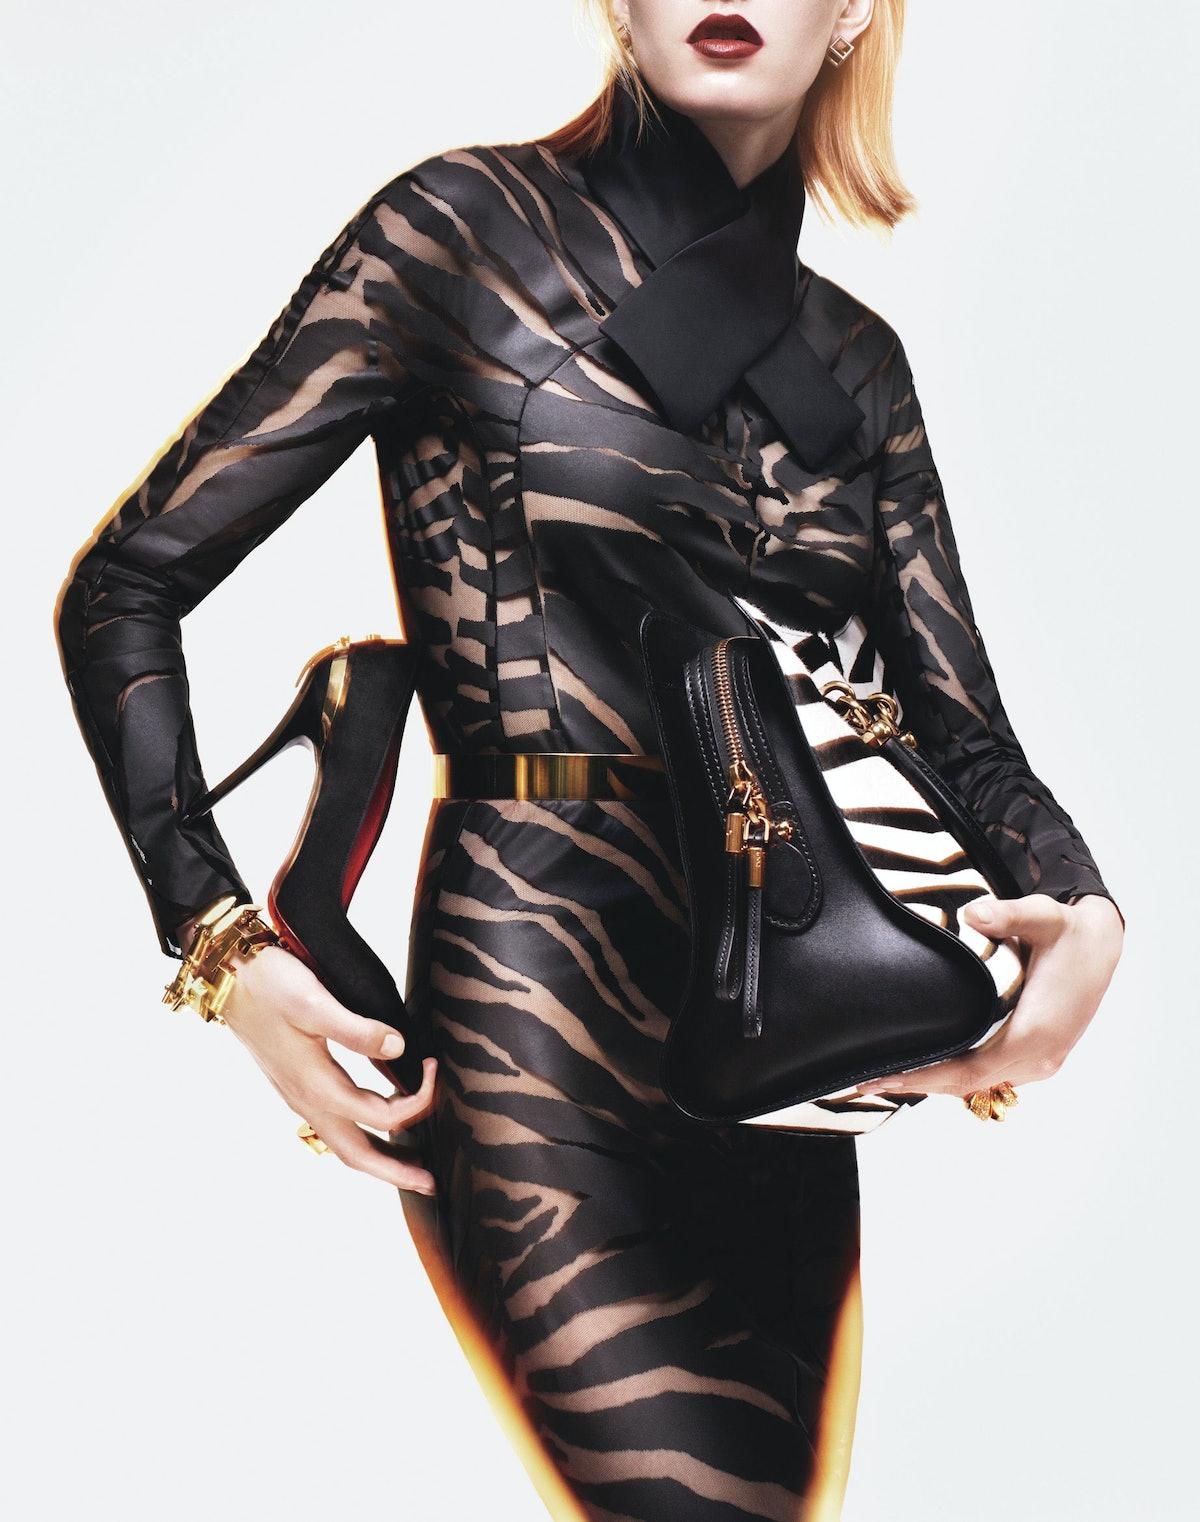 acss-wild-animal-print-accessories-04